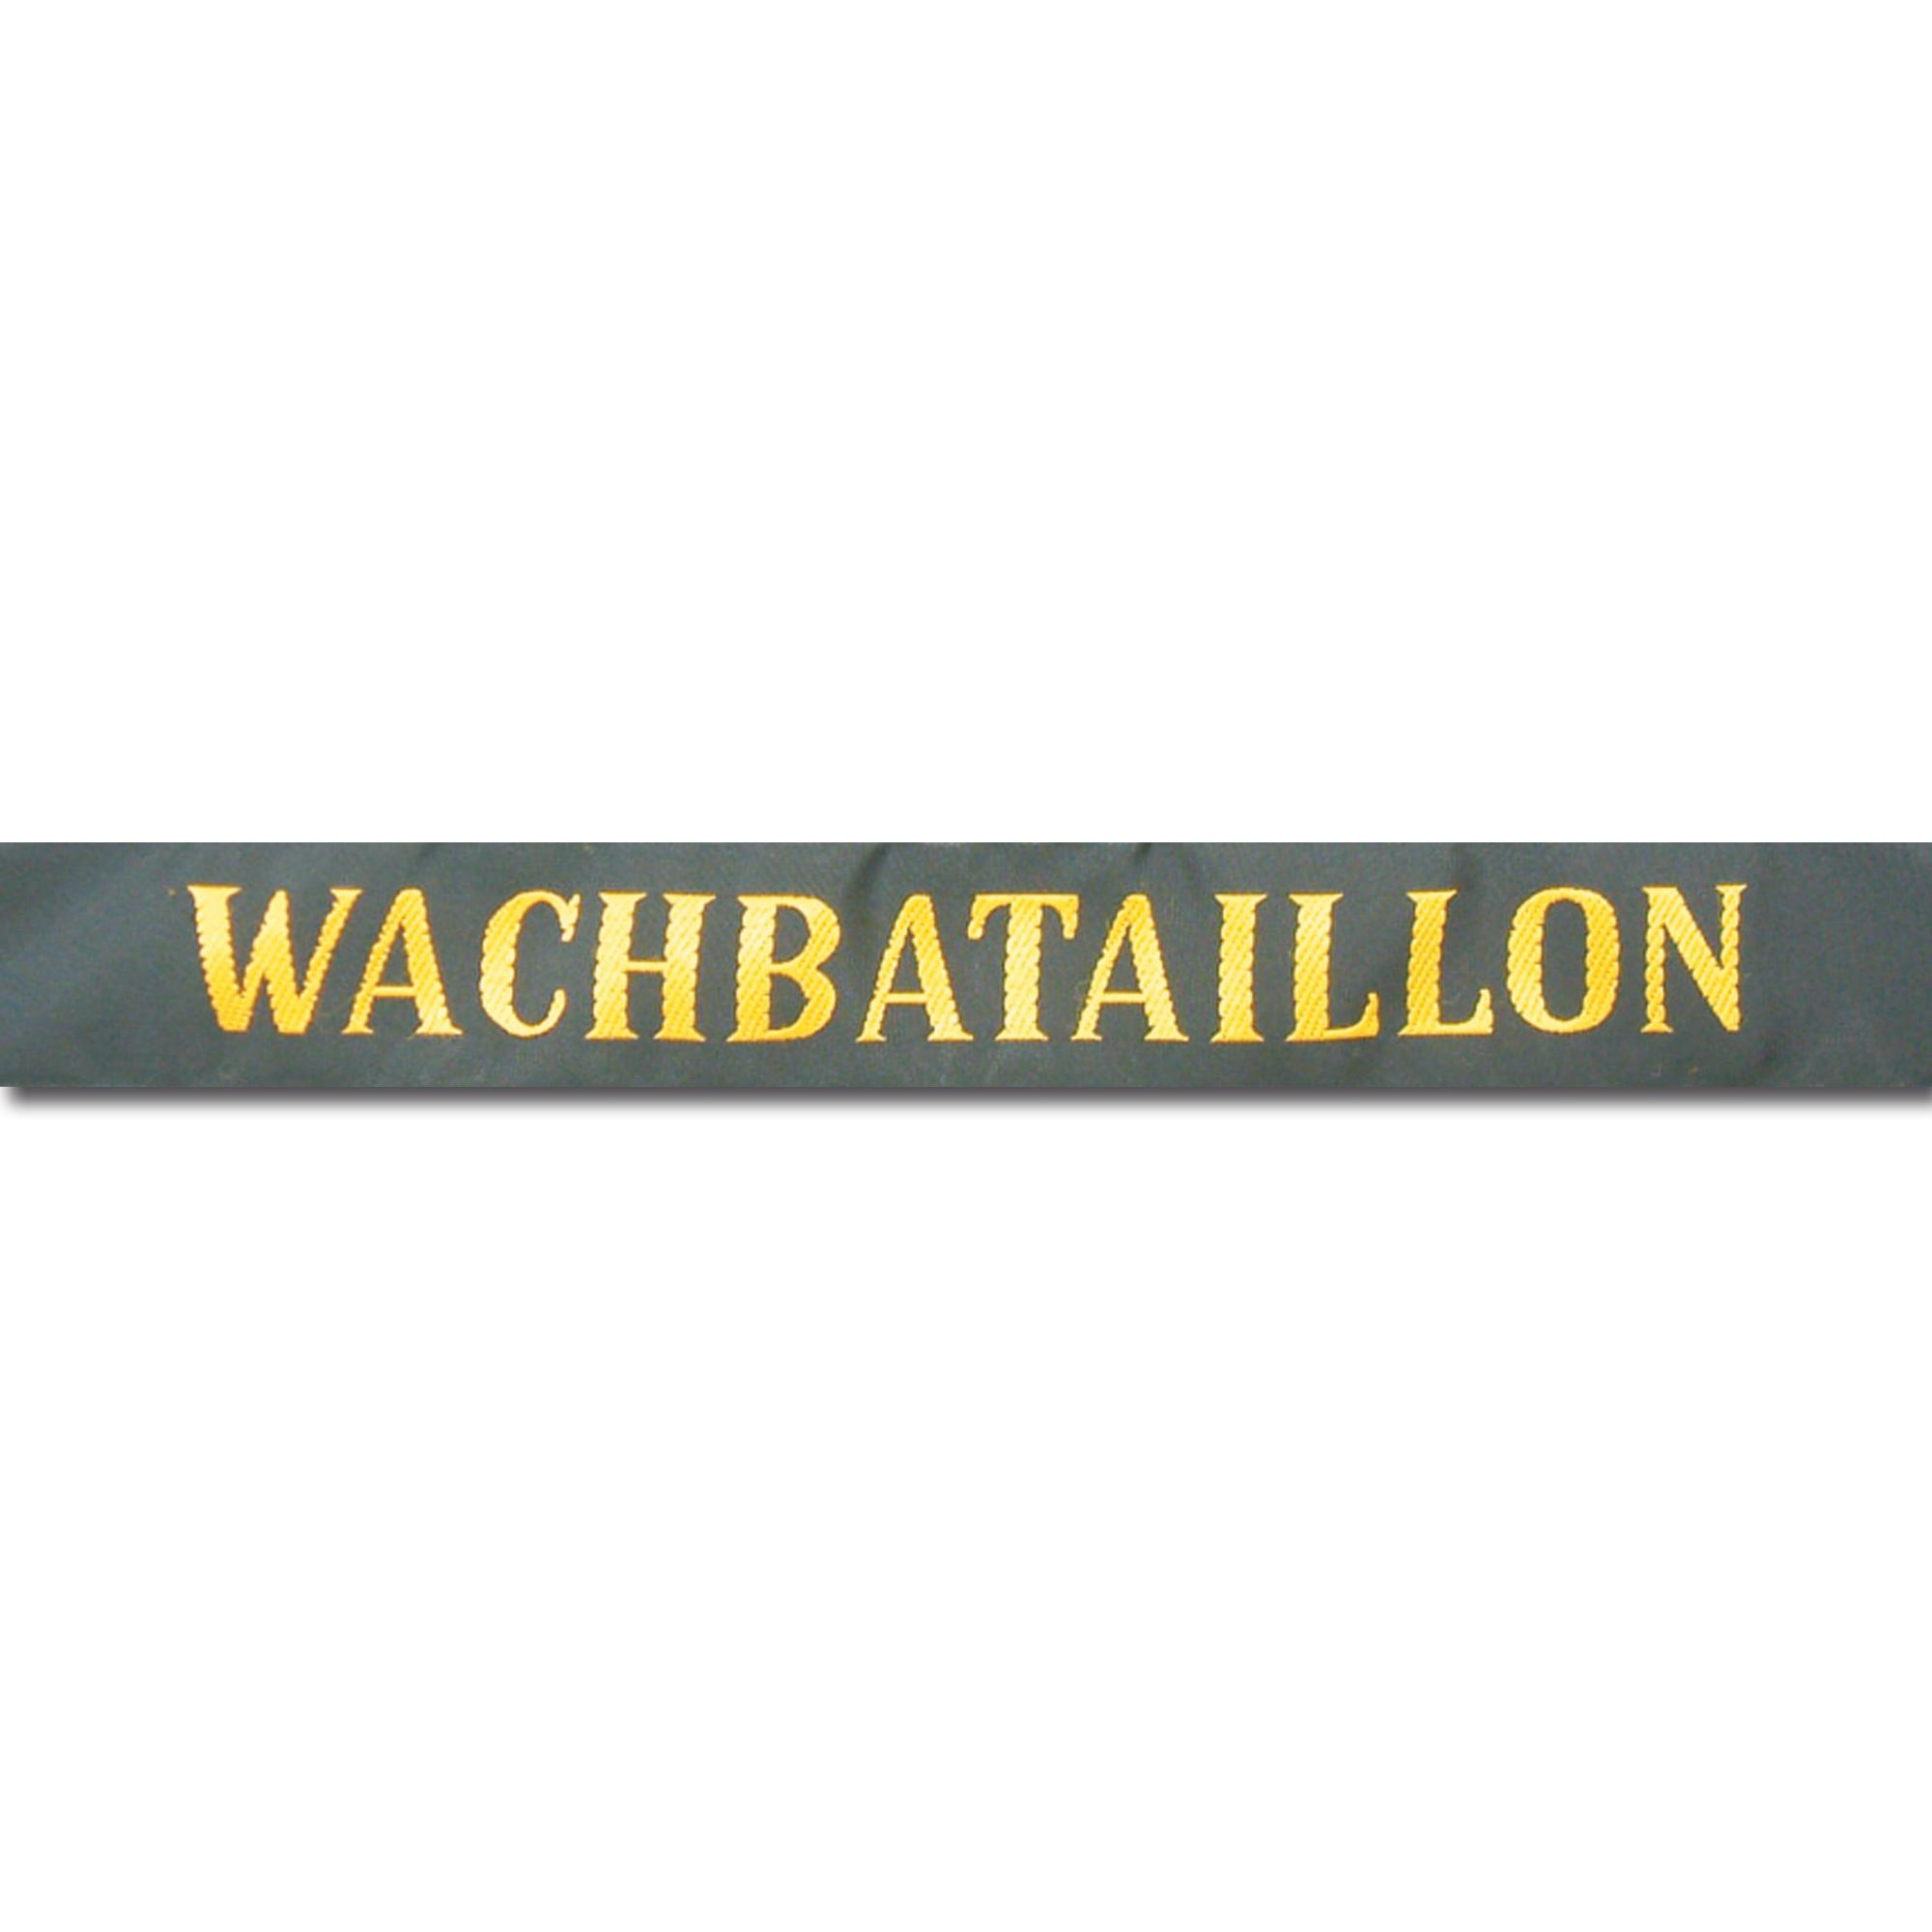 Bandeau de casquette marine Wachbataillon